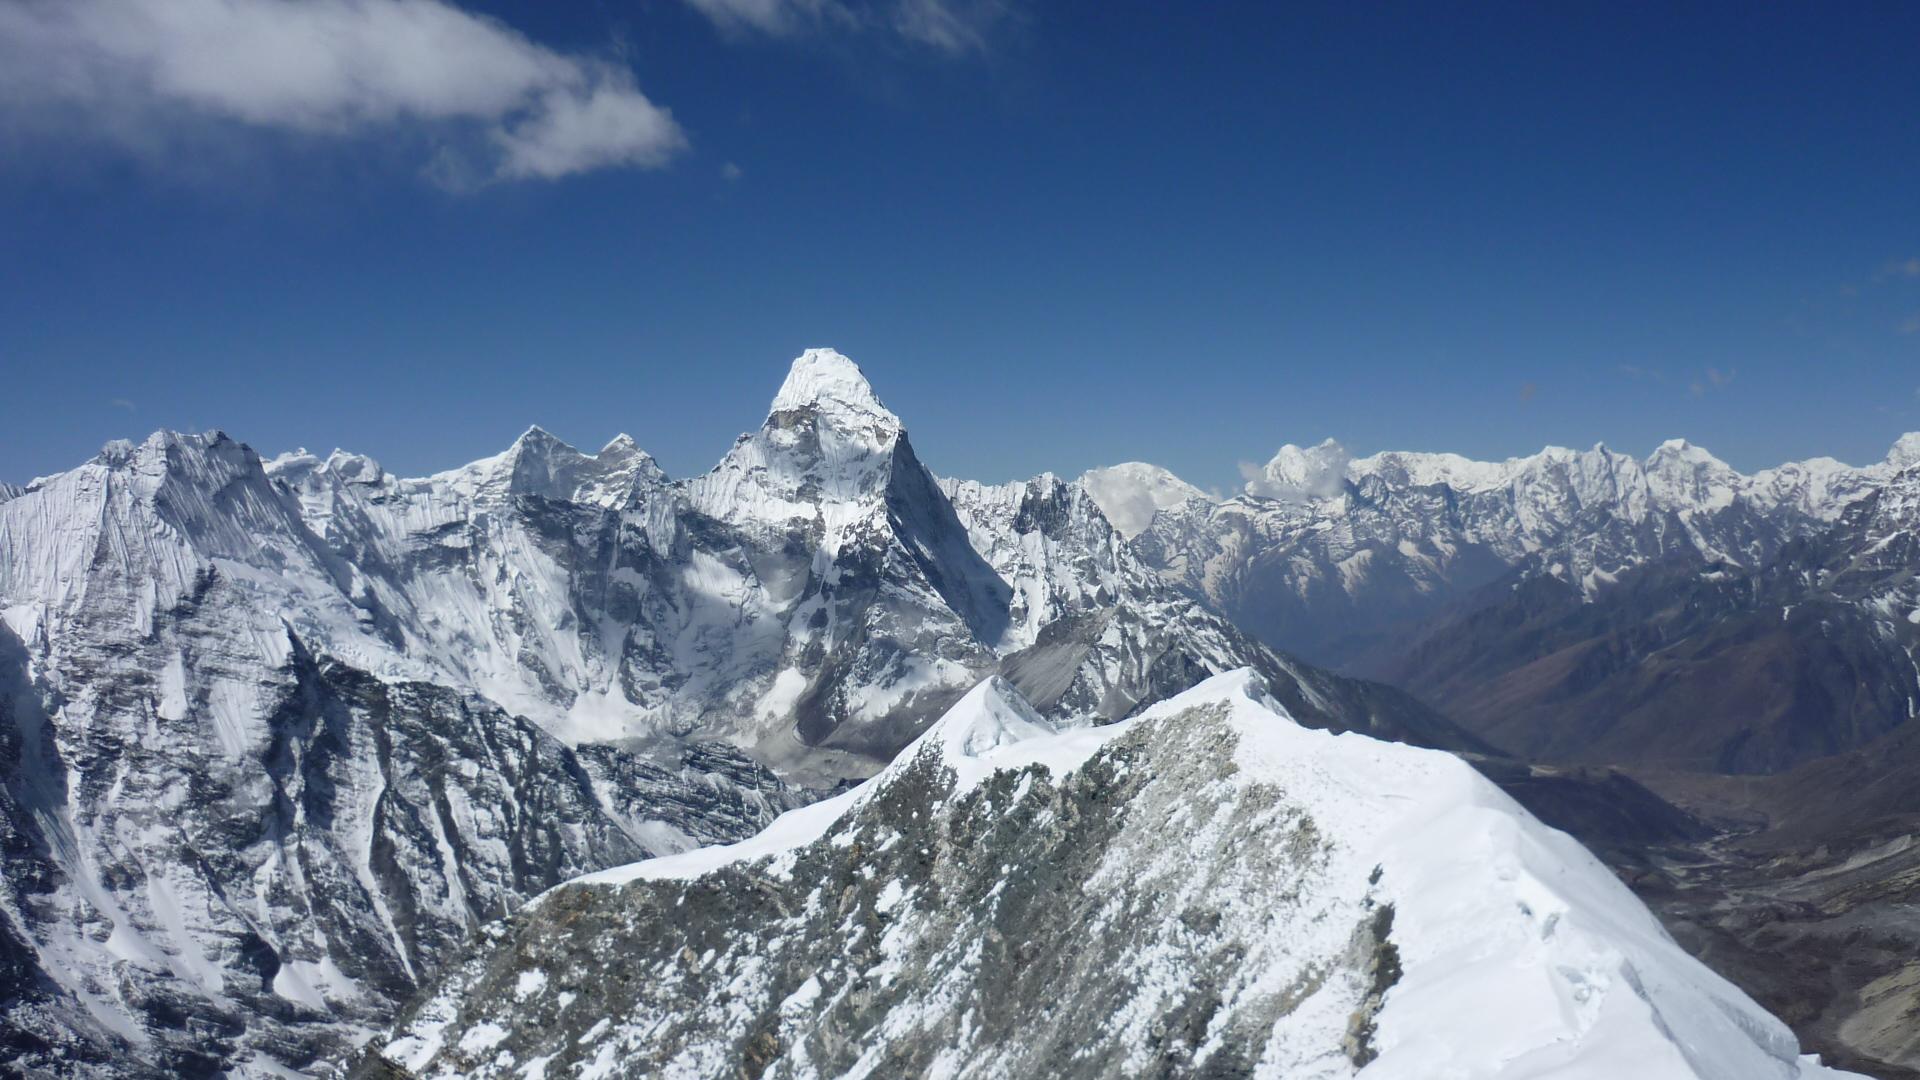 Summit of Island Peak with Amadablam in background